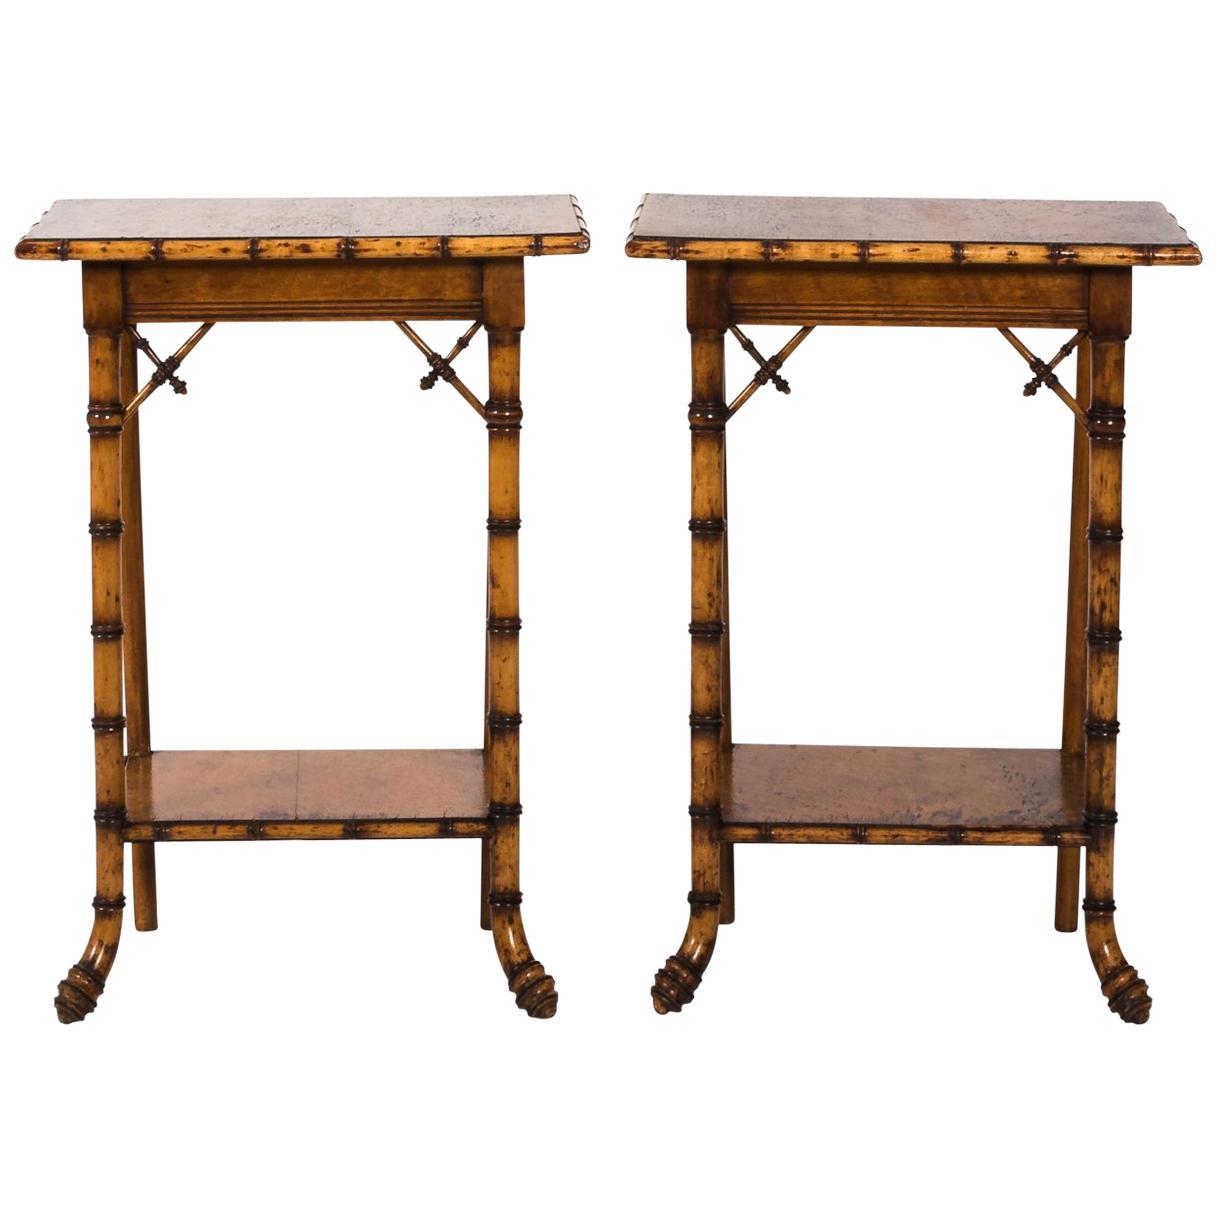 French Eastlake Style Birdu0027s Eye Maple Side Tables, Circa 1890